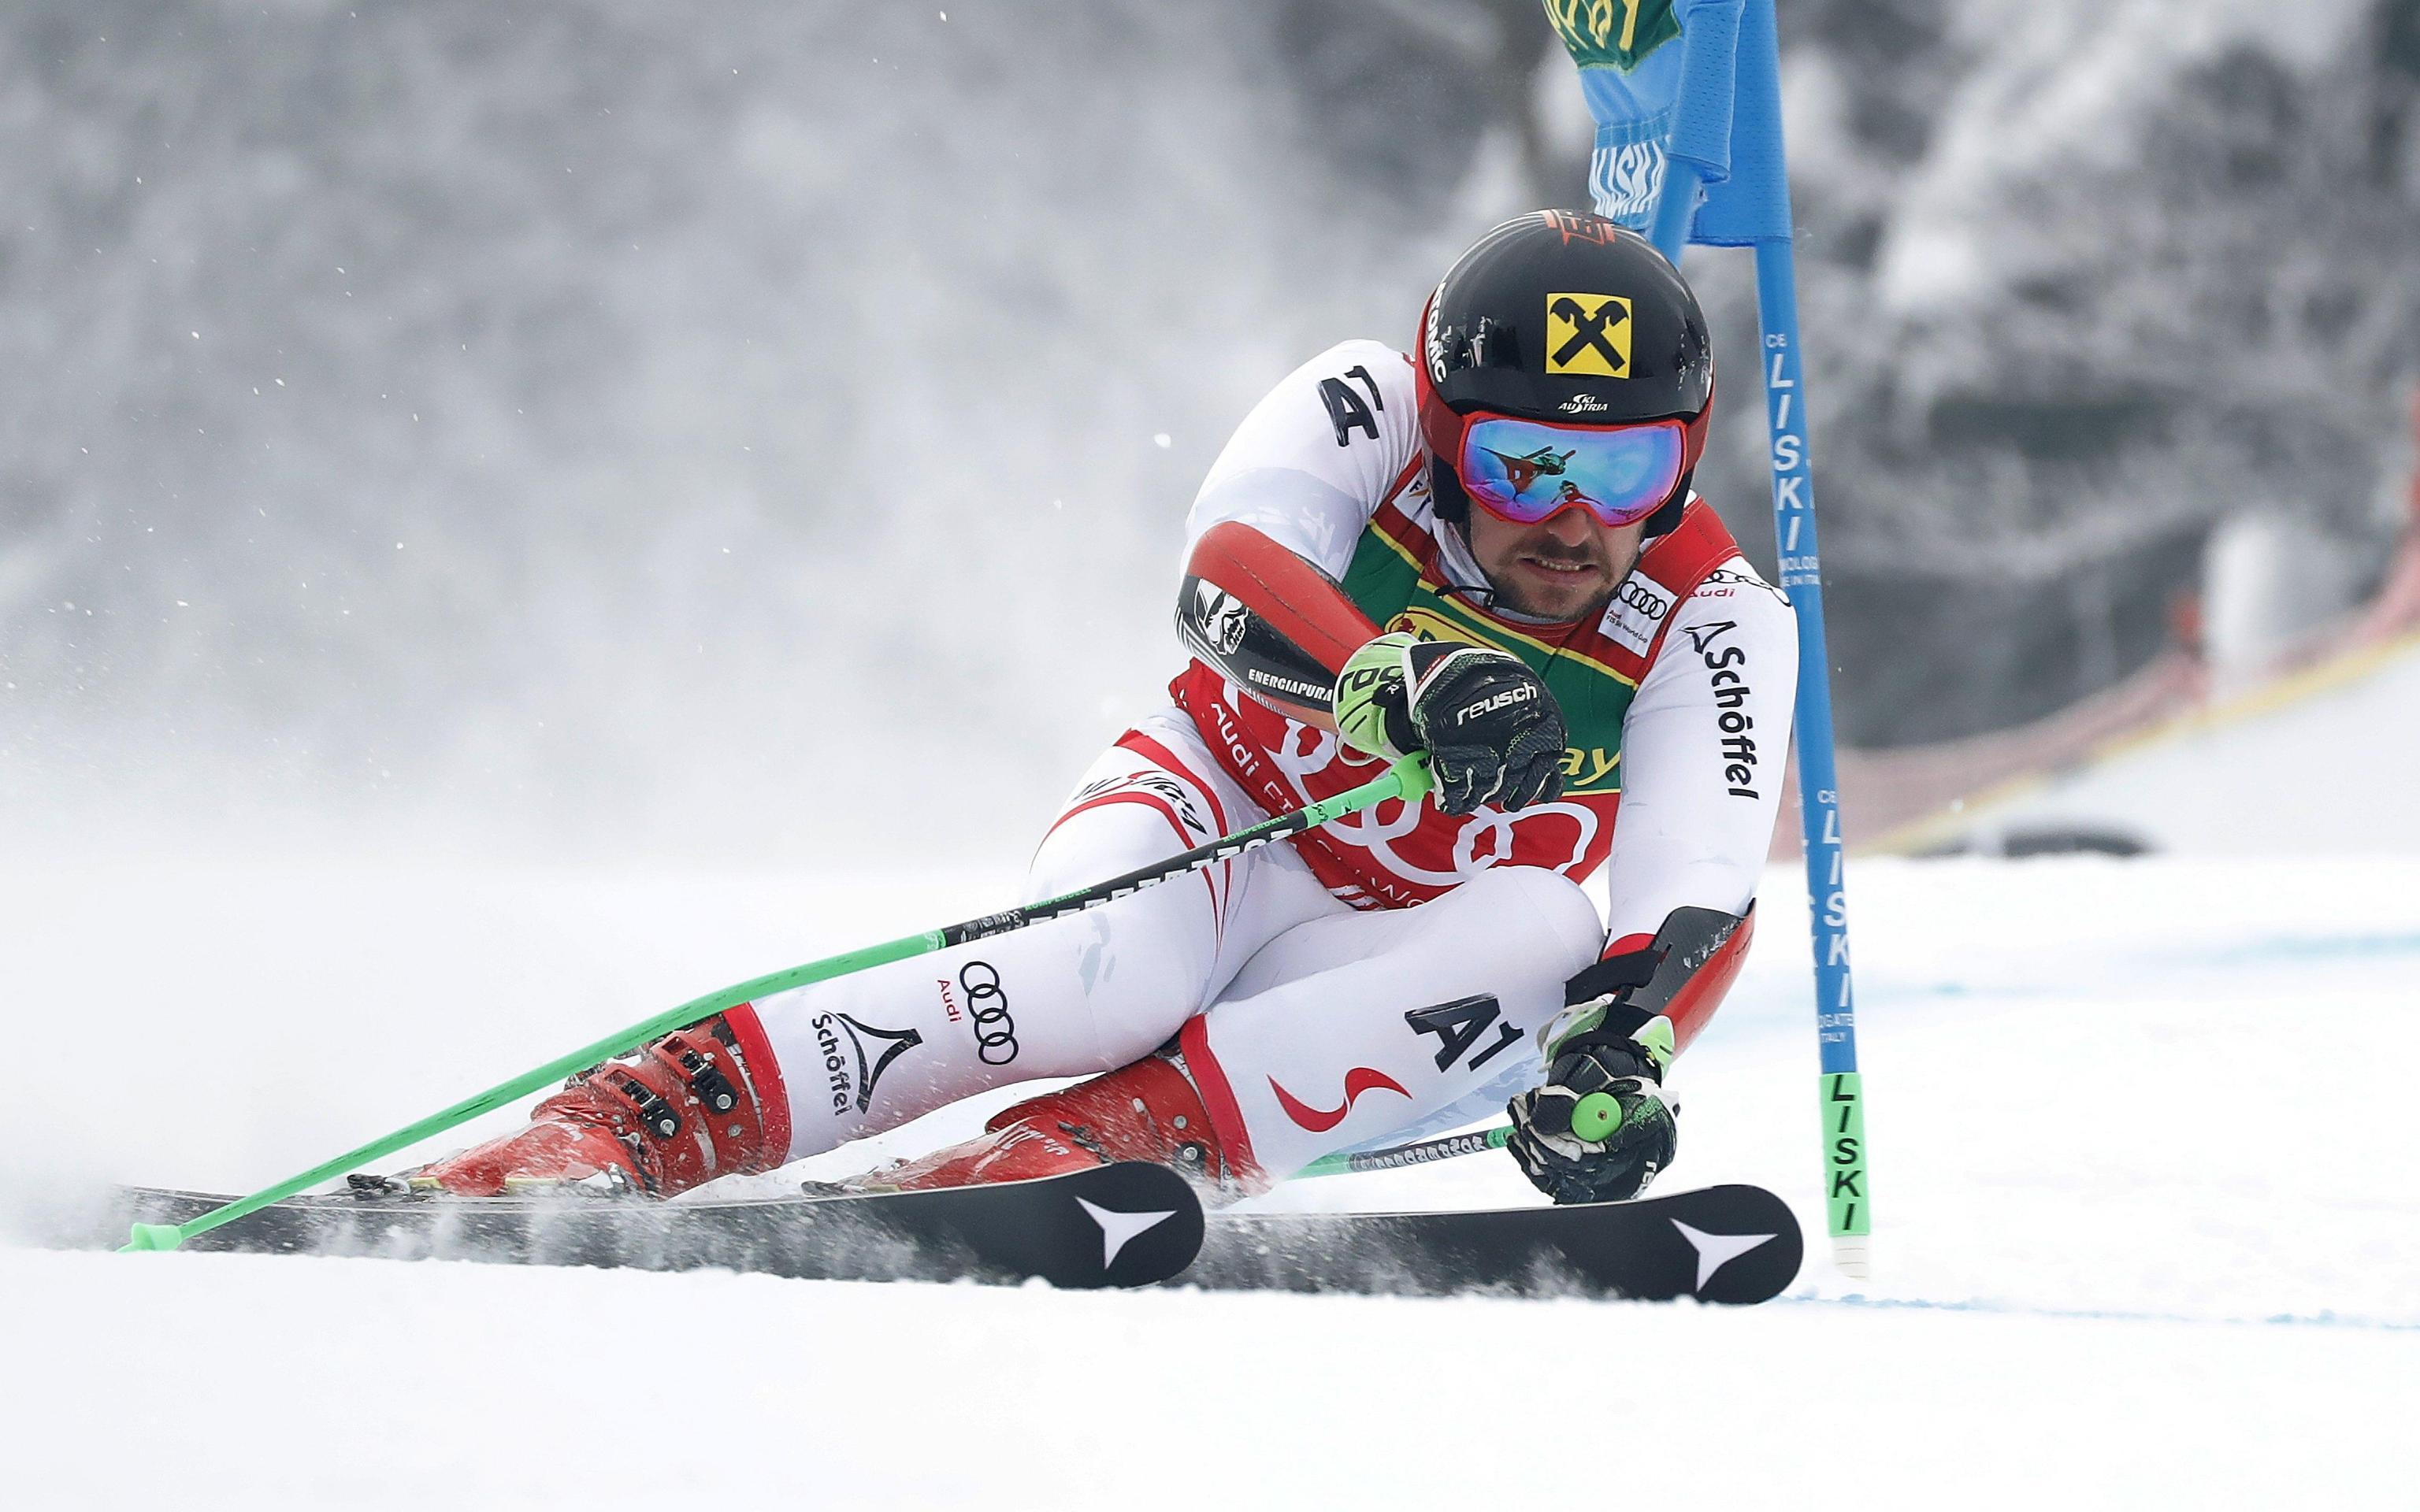 Slalom Kranjska Gora: comanda sempre Hirscher, Kristoffersen 2°